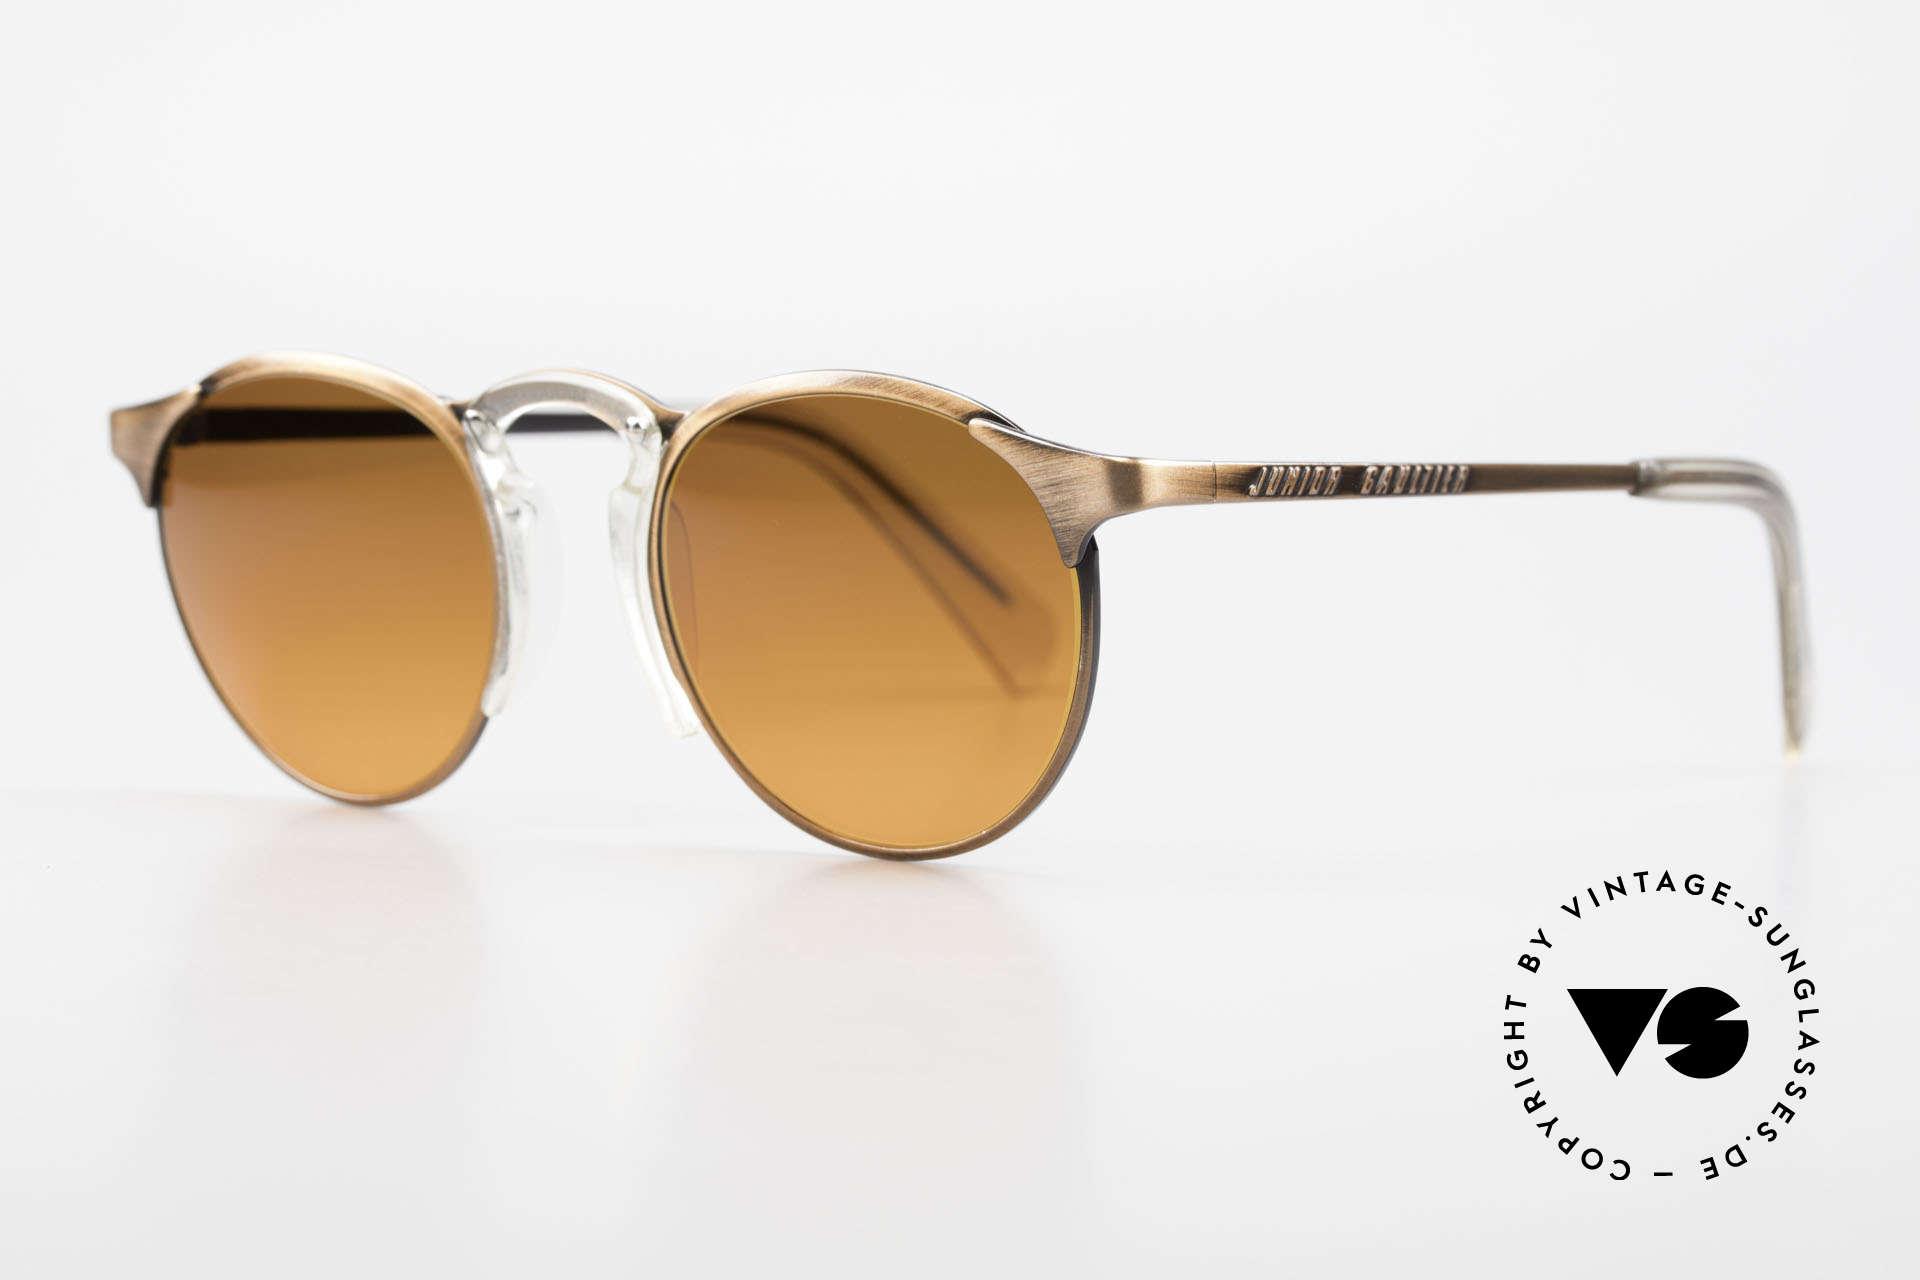 Jean Paul Gaultier 57-0174 90's JPG Panto Sunglasses, outstanding craftsmanship (frame made in Japan), Made for Men